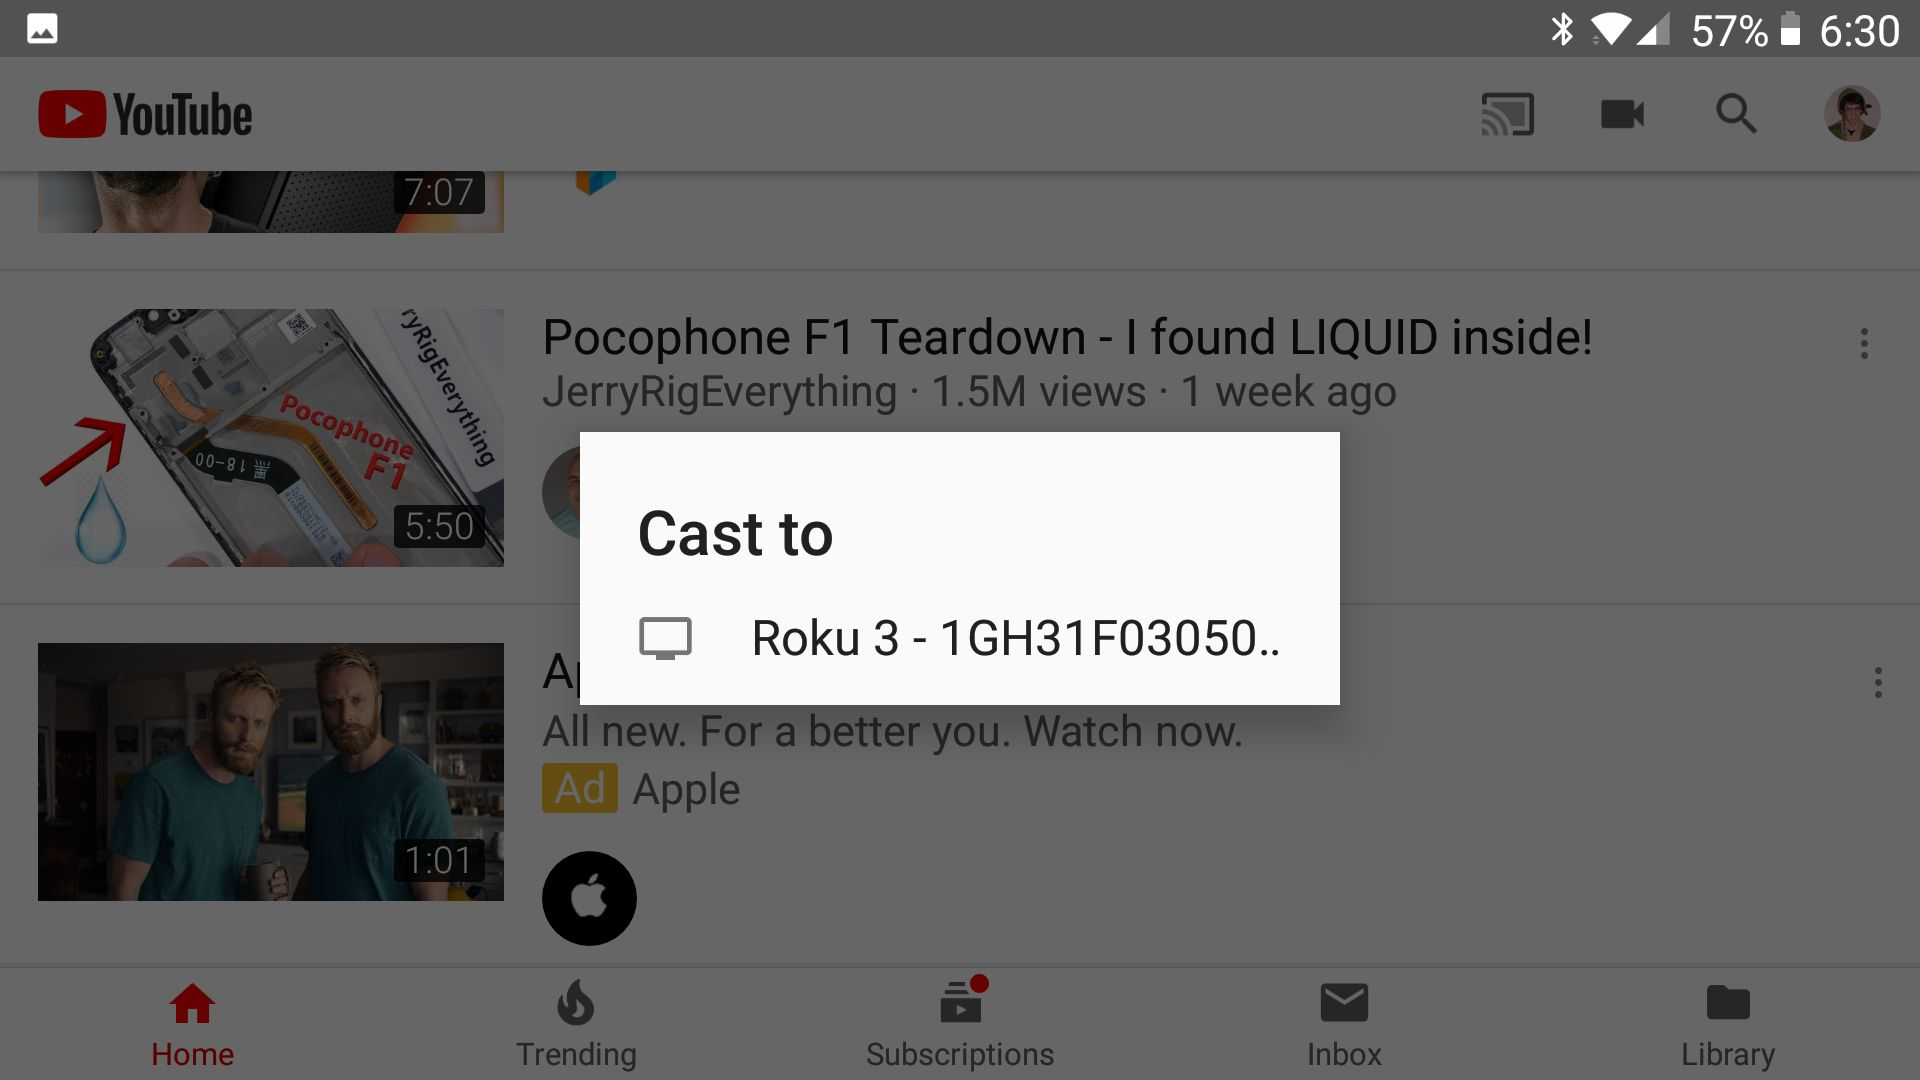 Youtube TV on roku device